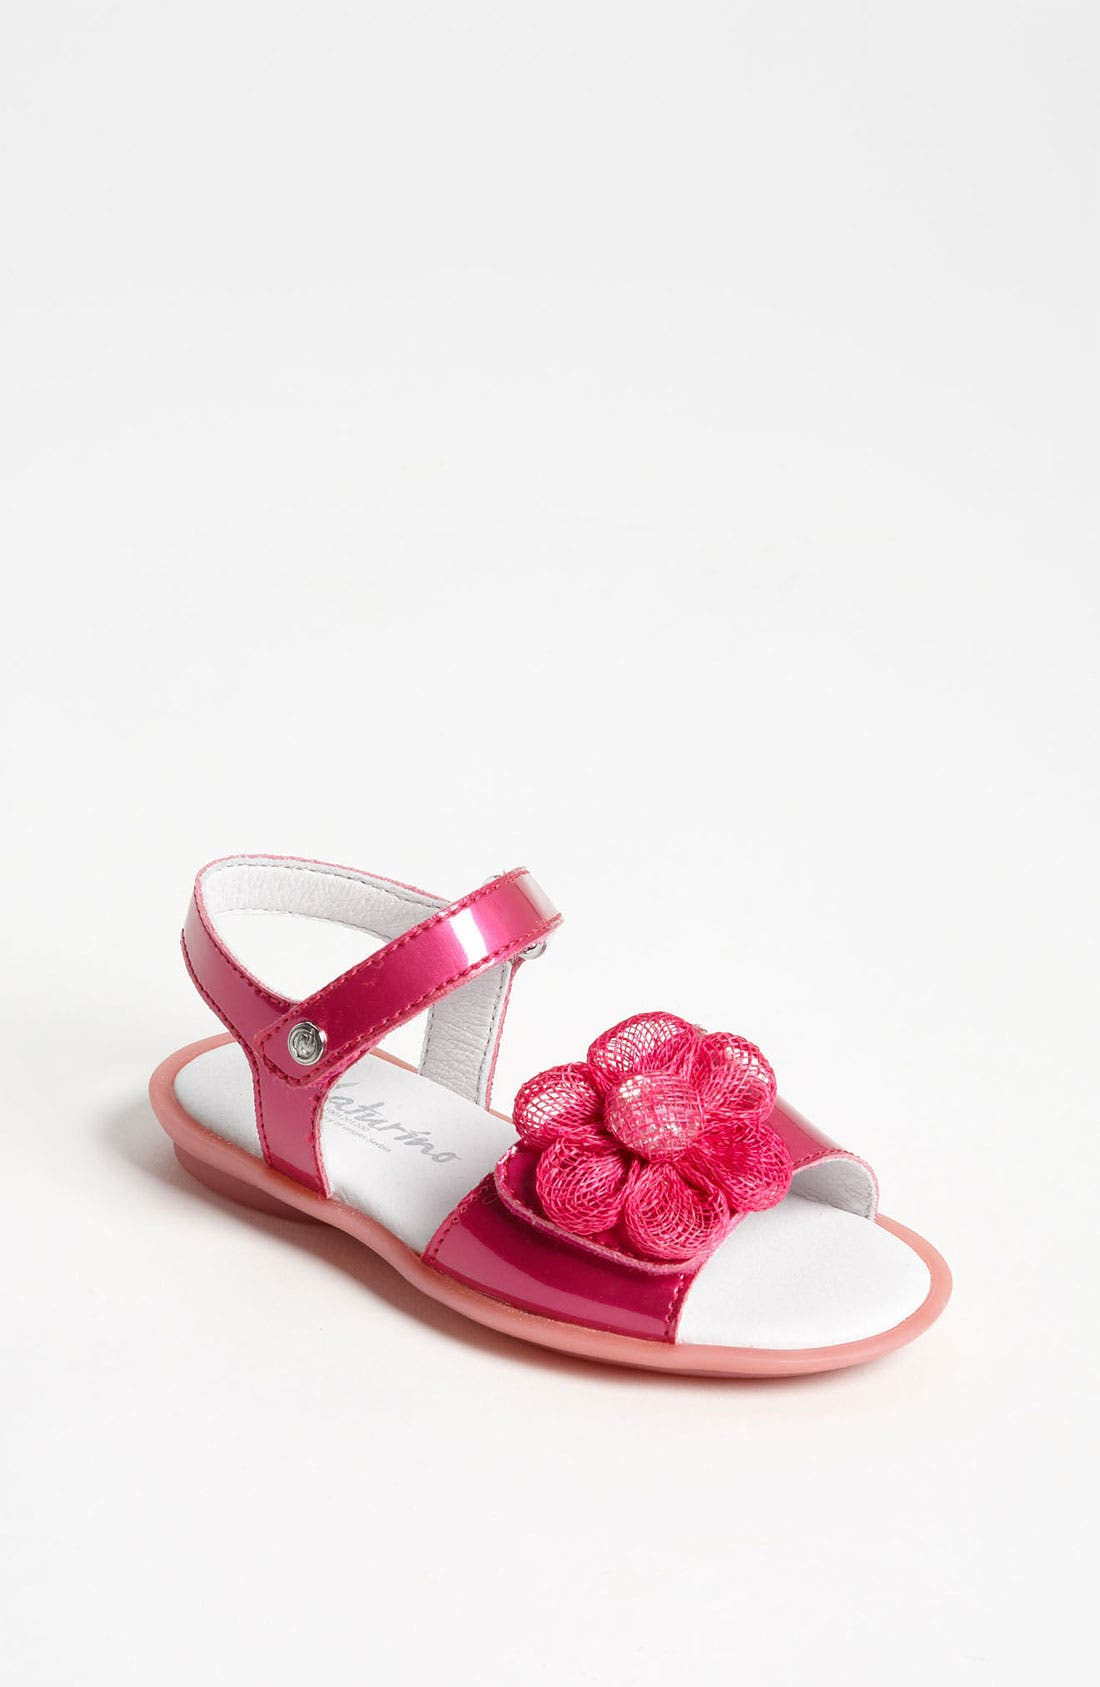 Alternate Image 1 Selected - Naturino '3022' Sandal (Toddler)